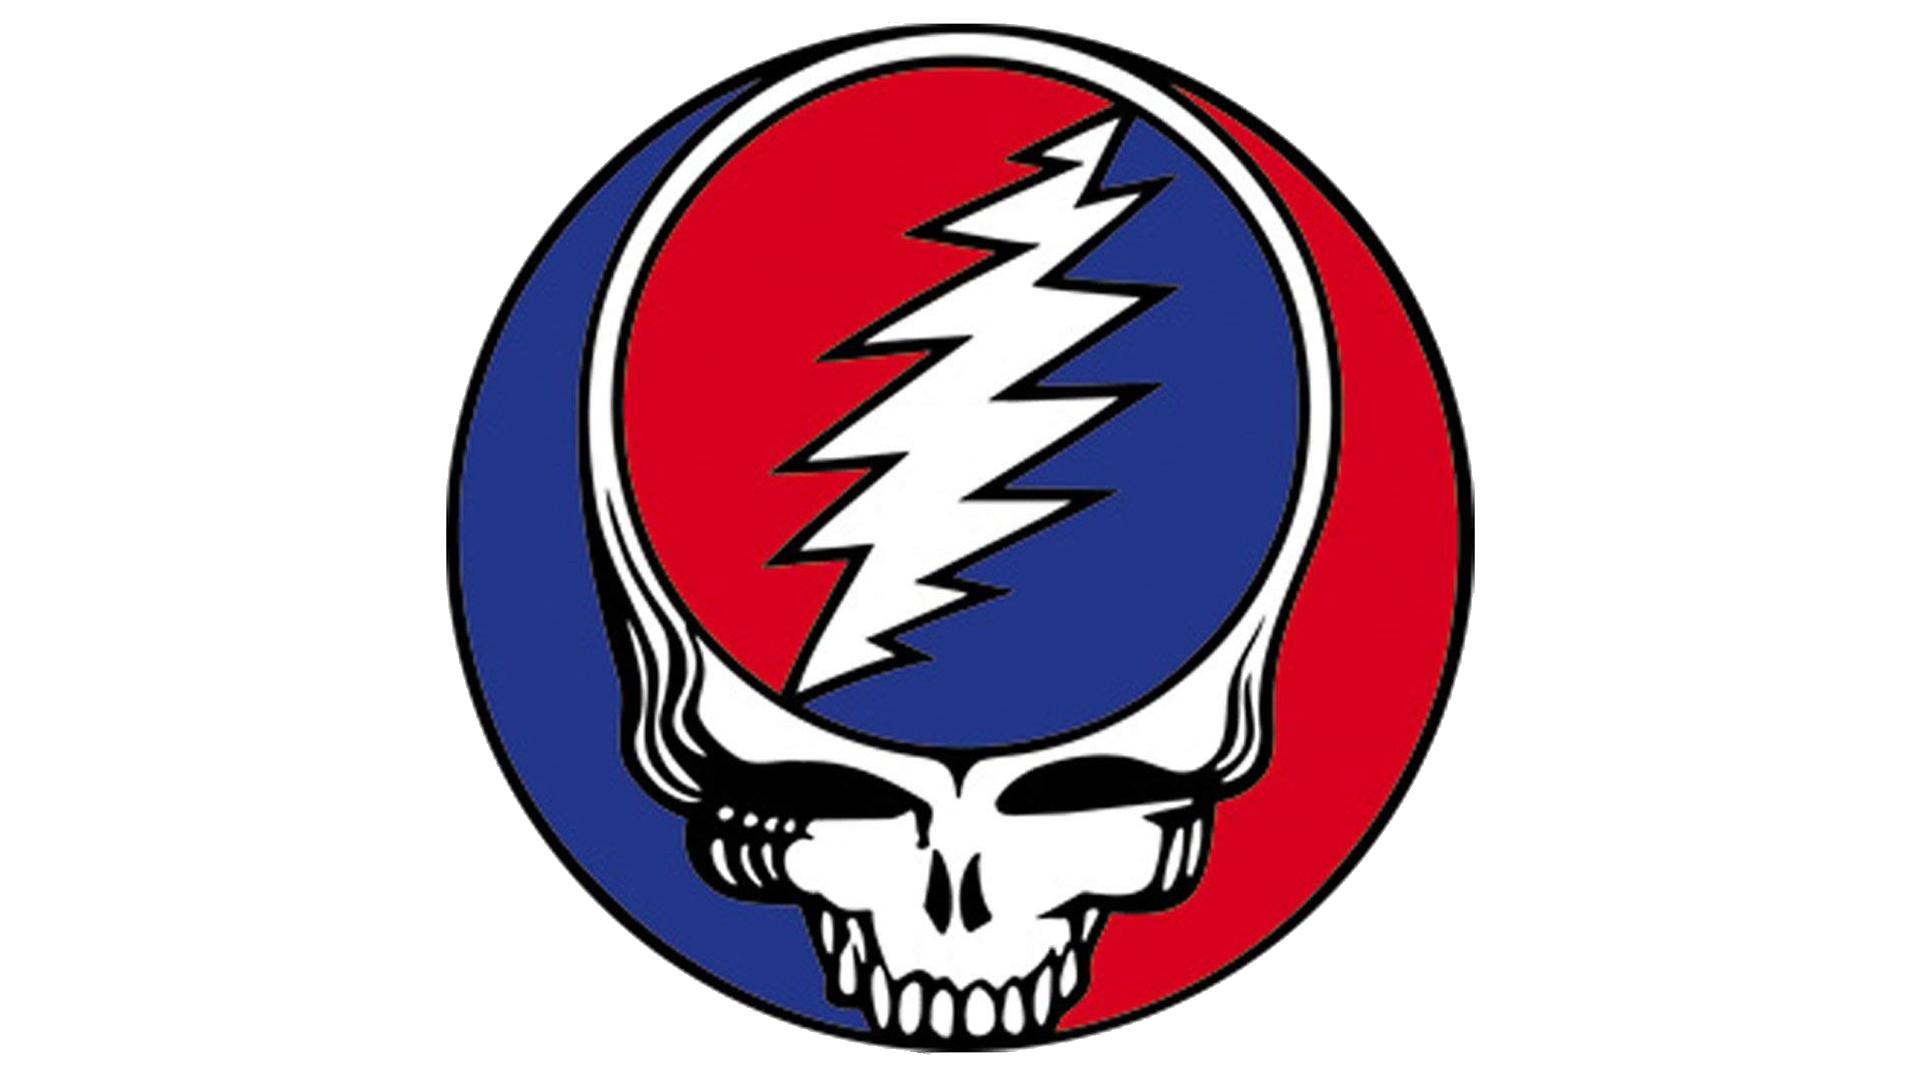 Https 1000logos Net Wp Content Uploads 2018 08 Grateful Dead Logo Png In 2020 Grateful Dead Merchandise Grateful Dead Blue Tapestry